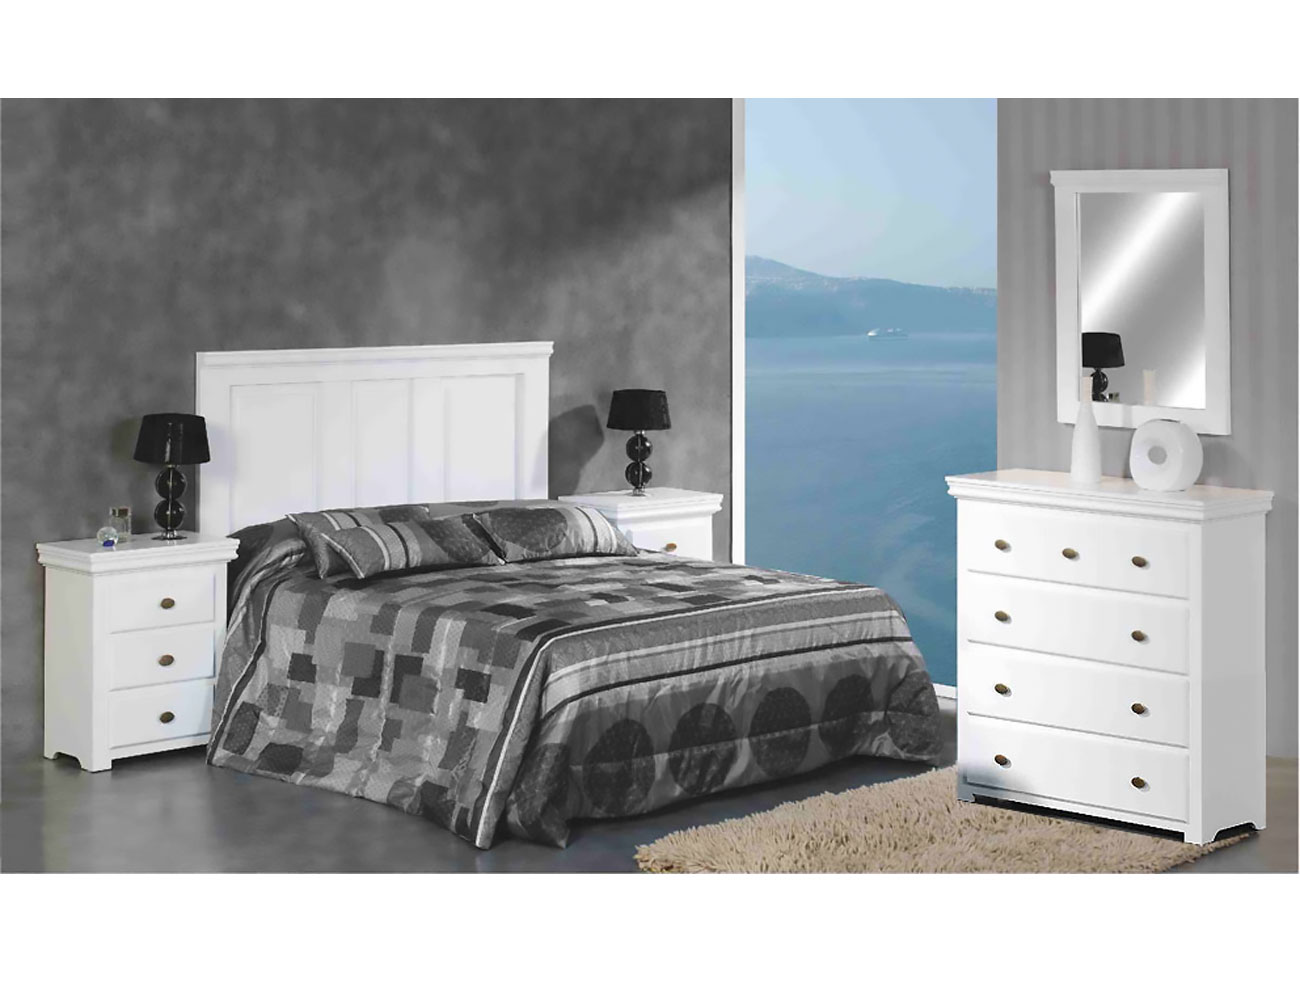 Dormitorio matrimonio comoda 5 c madera dm lacado blanco